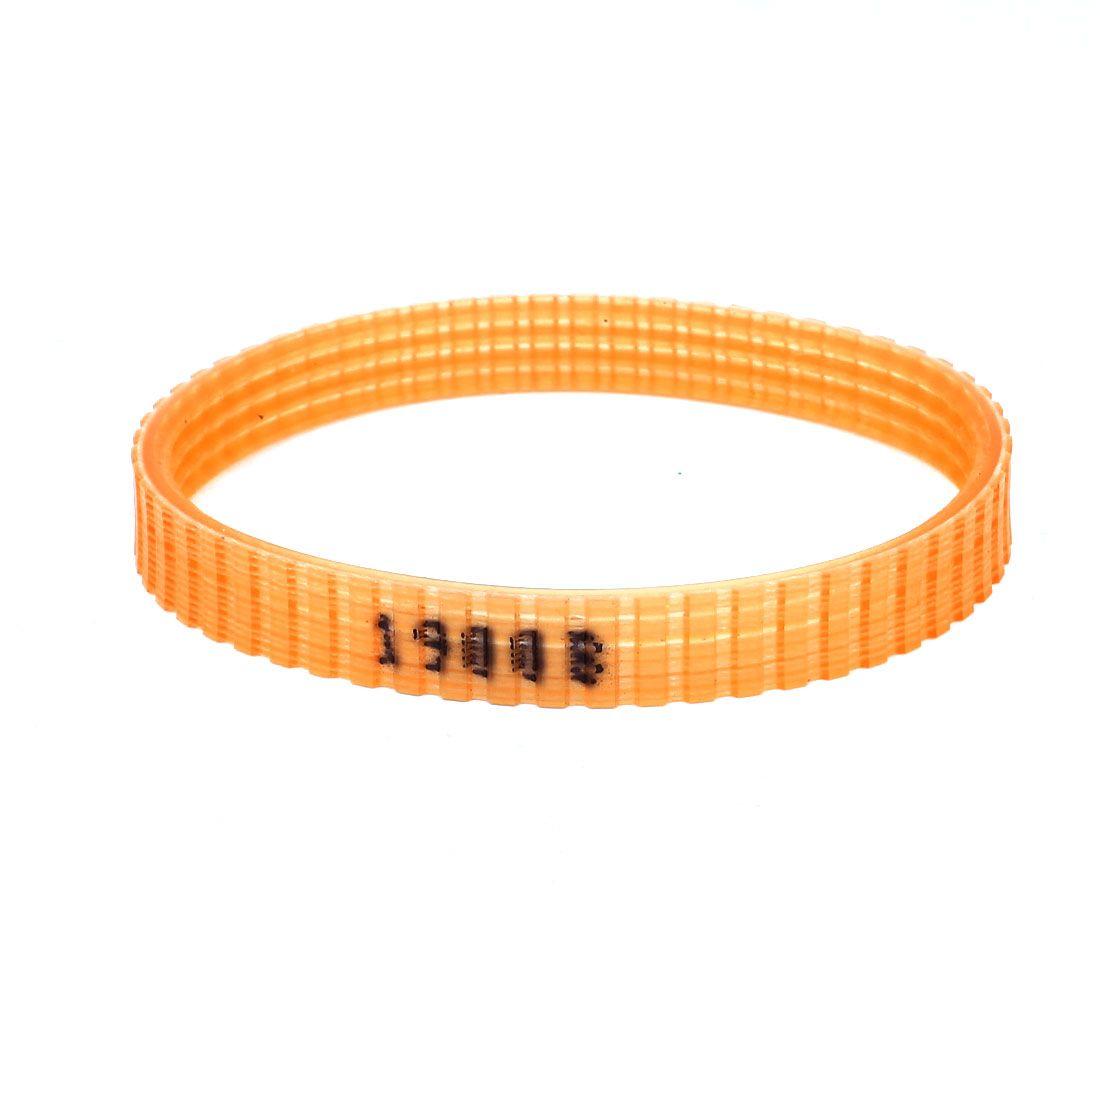 Uxcell 10mm Breite Elektrische Hobel Teil Stick Gürtel Band Apricot Für Makita 1900B Umfang 200mm 225mm 240mm 320mm 330mm